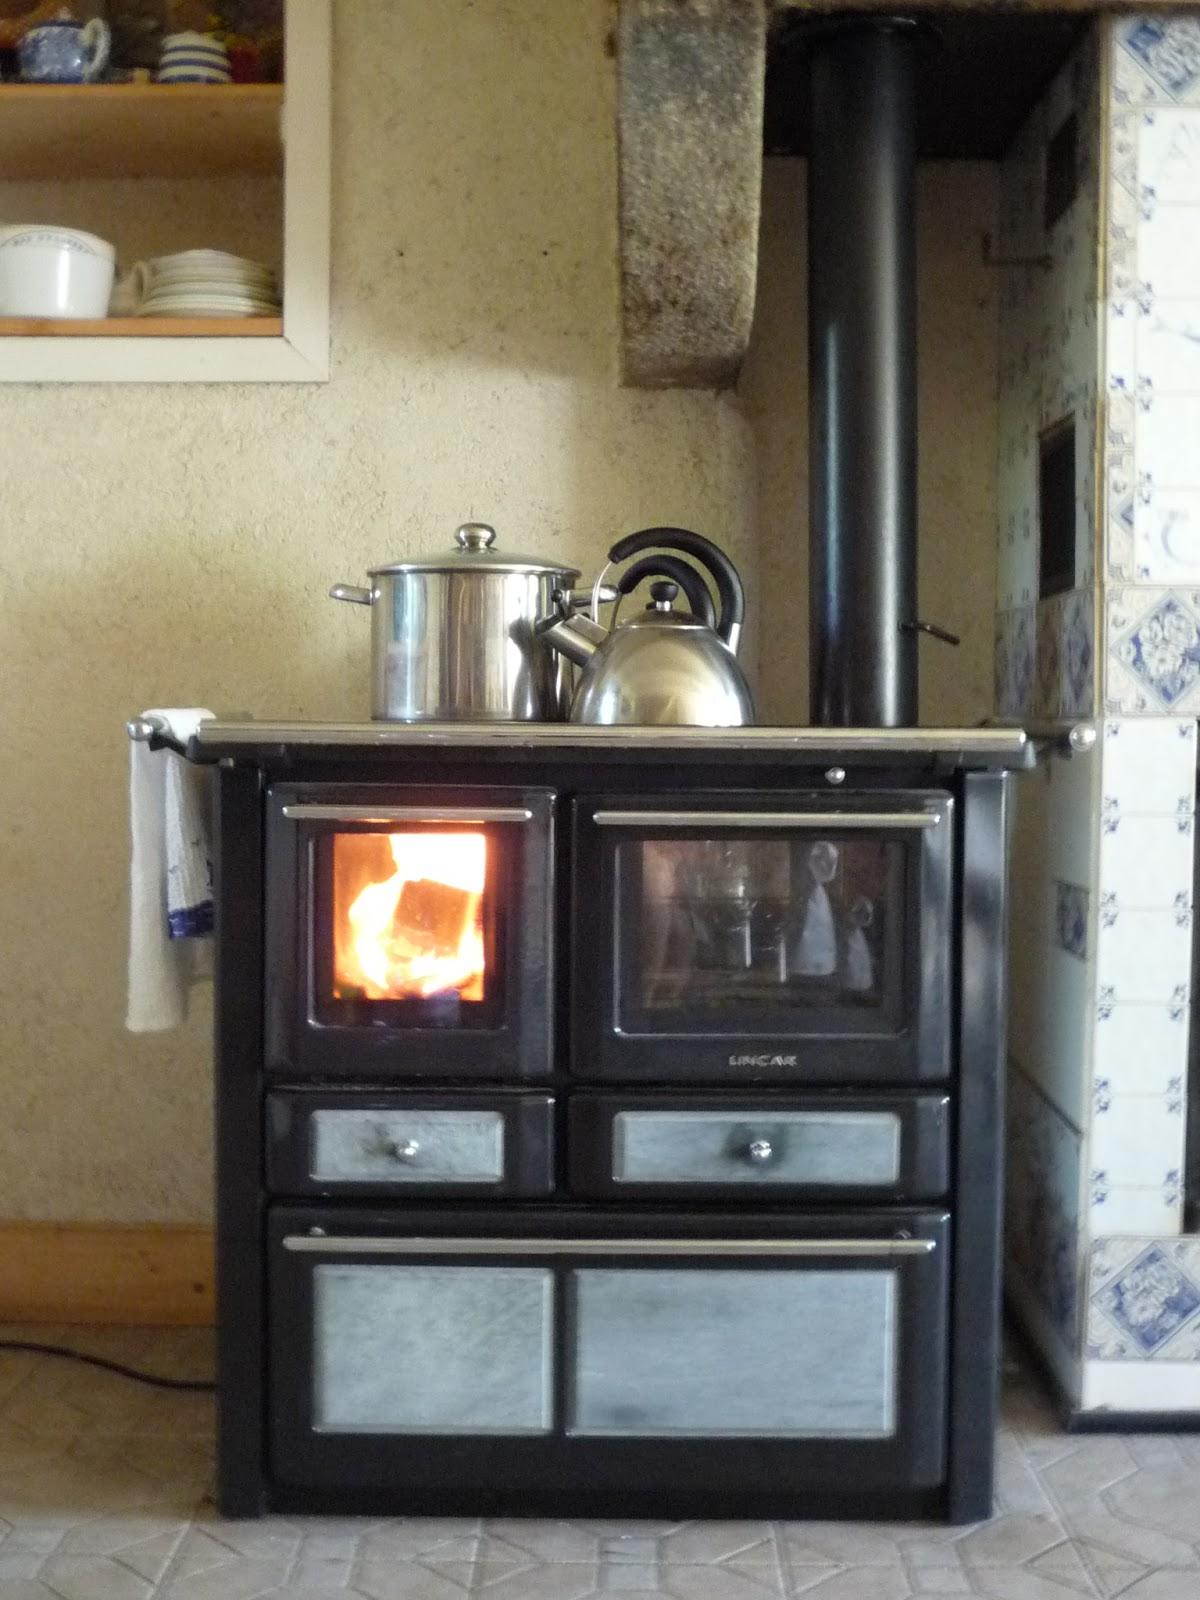 Lincar wood cooker